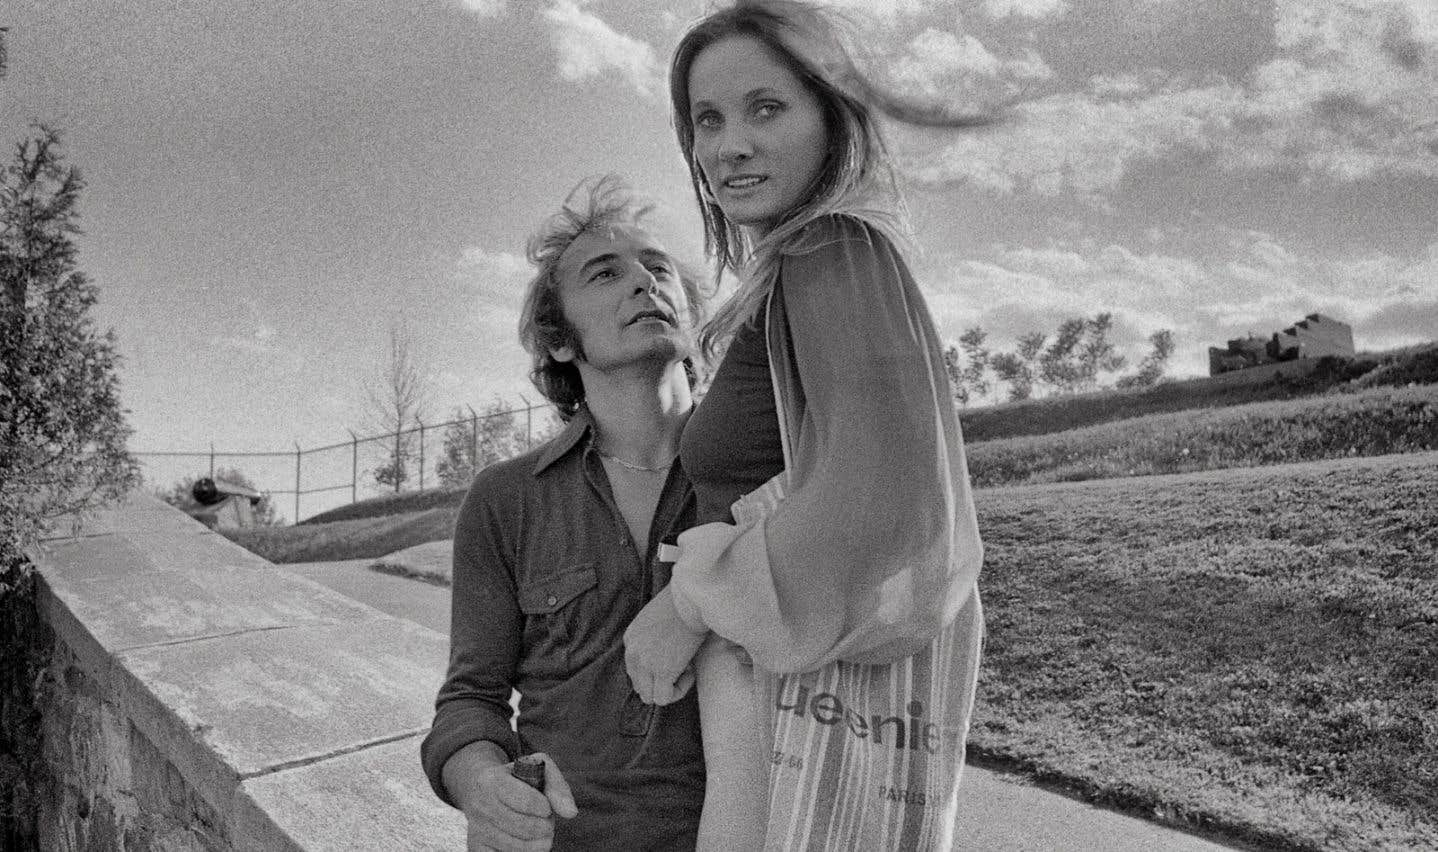 Yvon Deschamps et Diane Dufresne, 1975